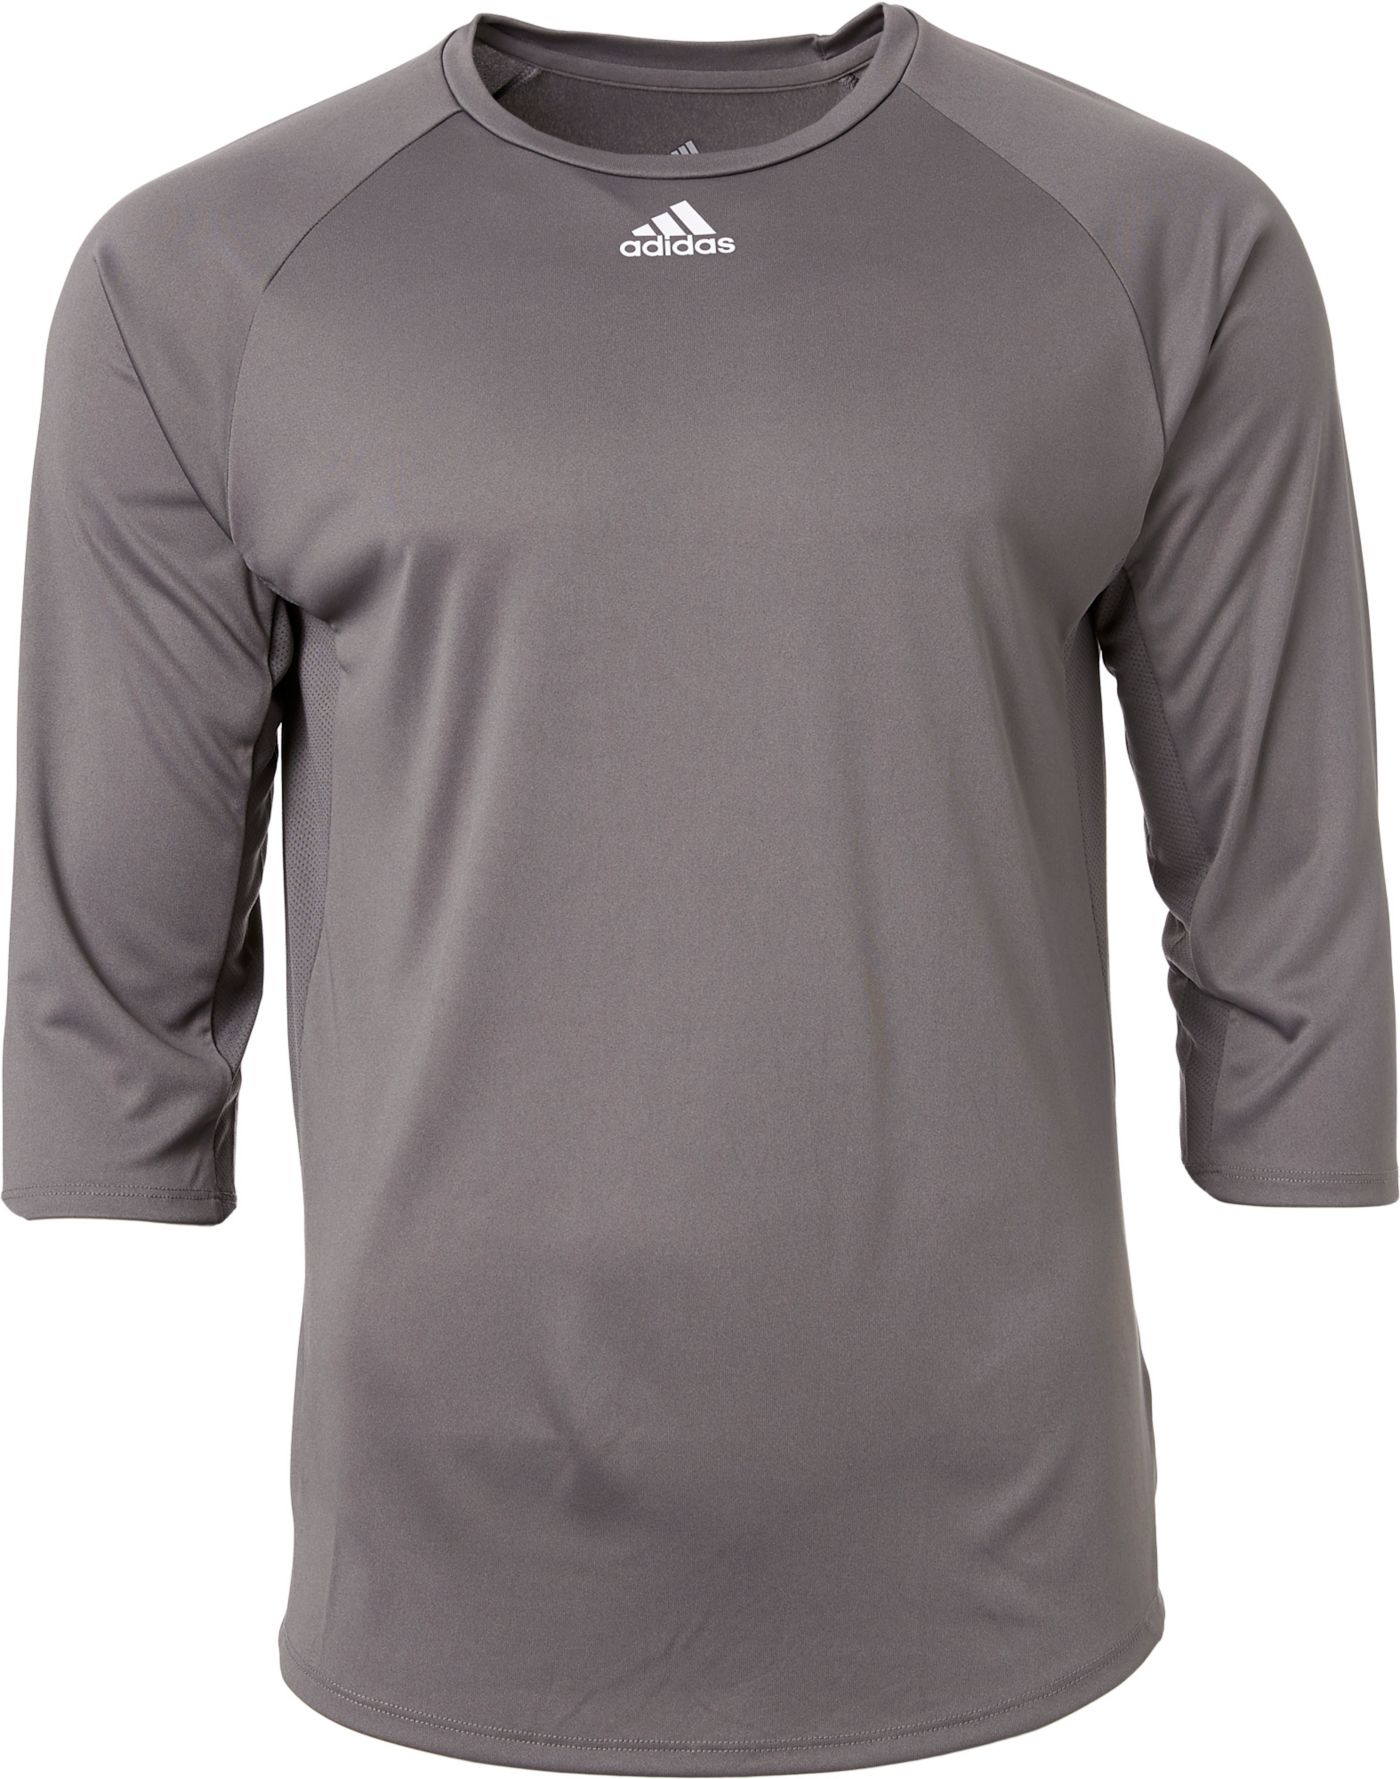 adidas Men's Triple Stripe ¾ Sleeve Tech Baseball Practice Shirt